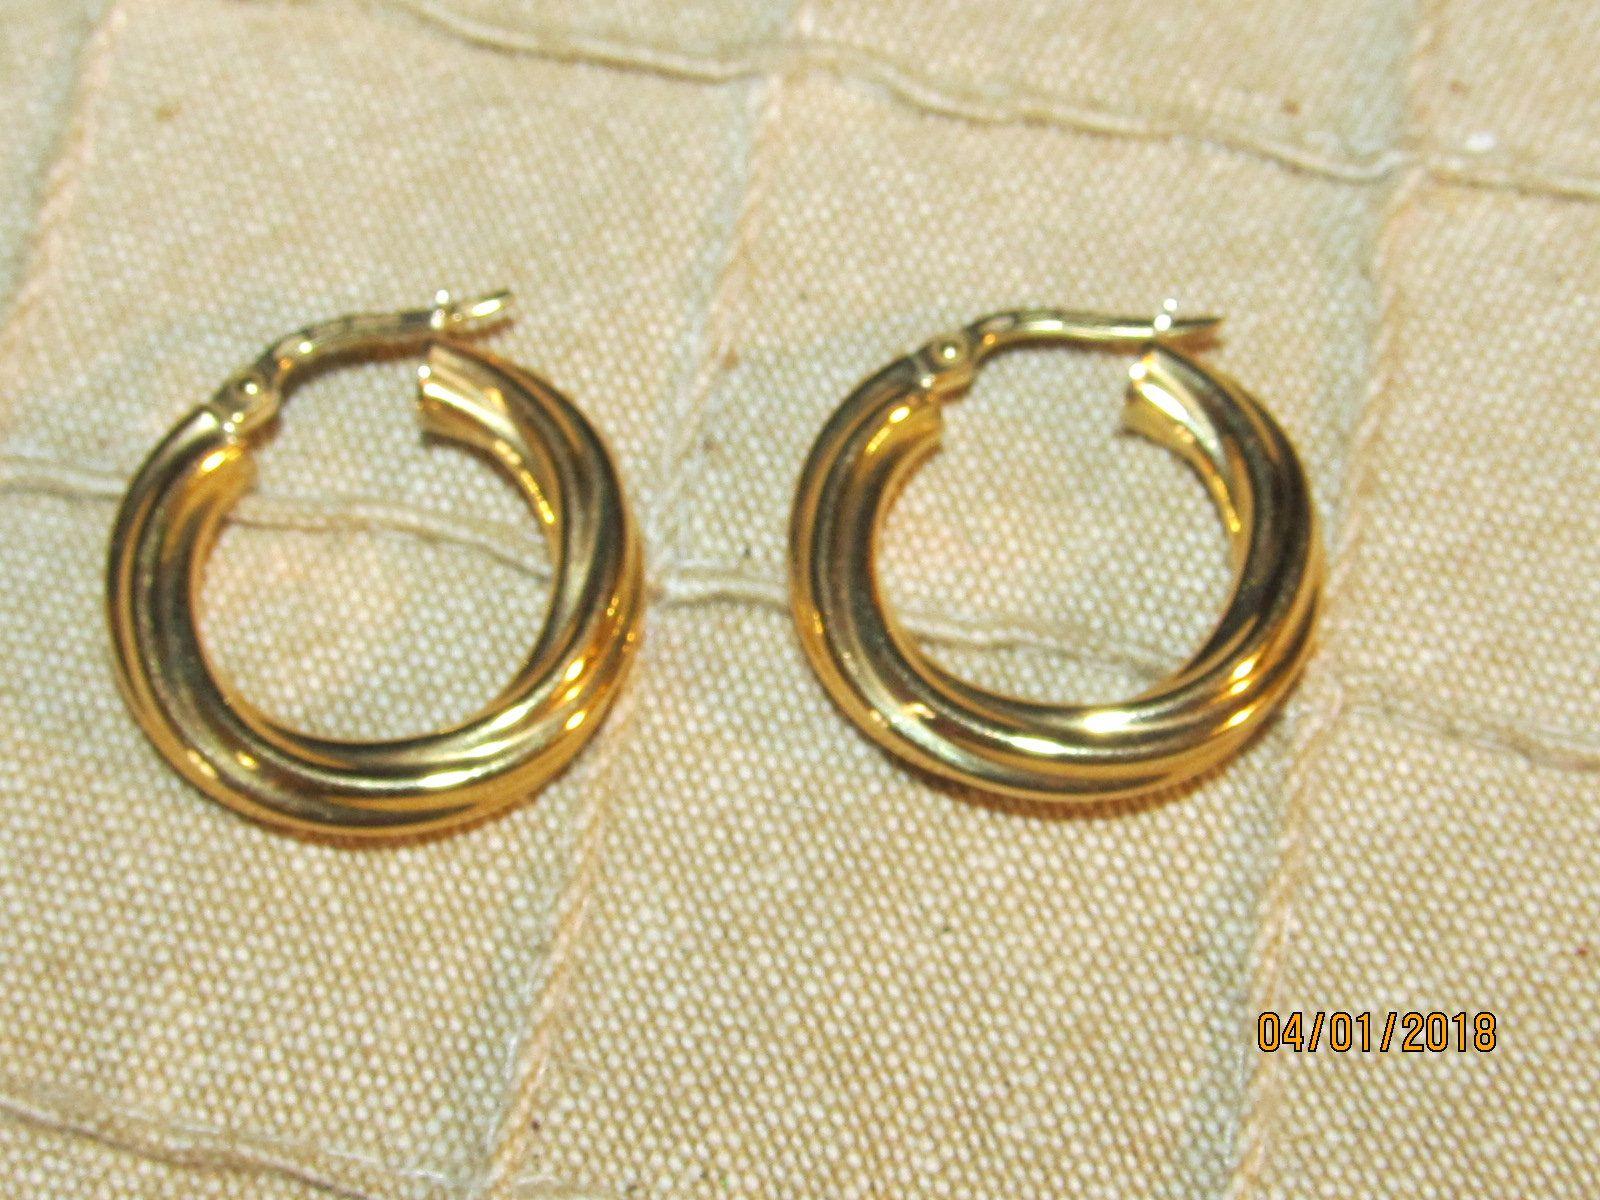 gold plated earrings Jewelry 18K gold plated hoop earrings 750